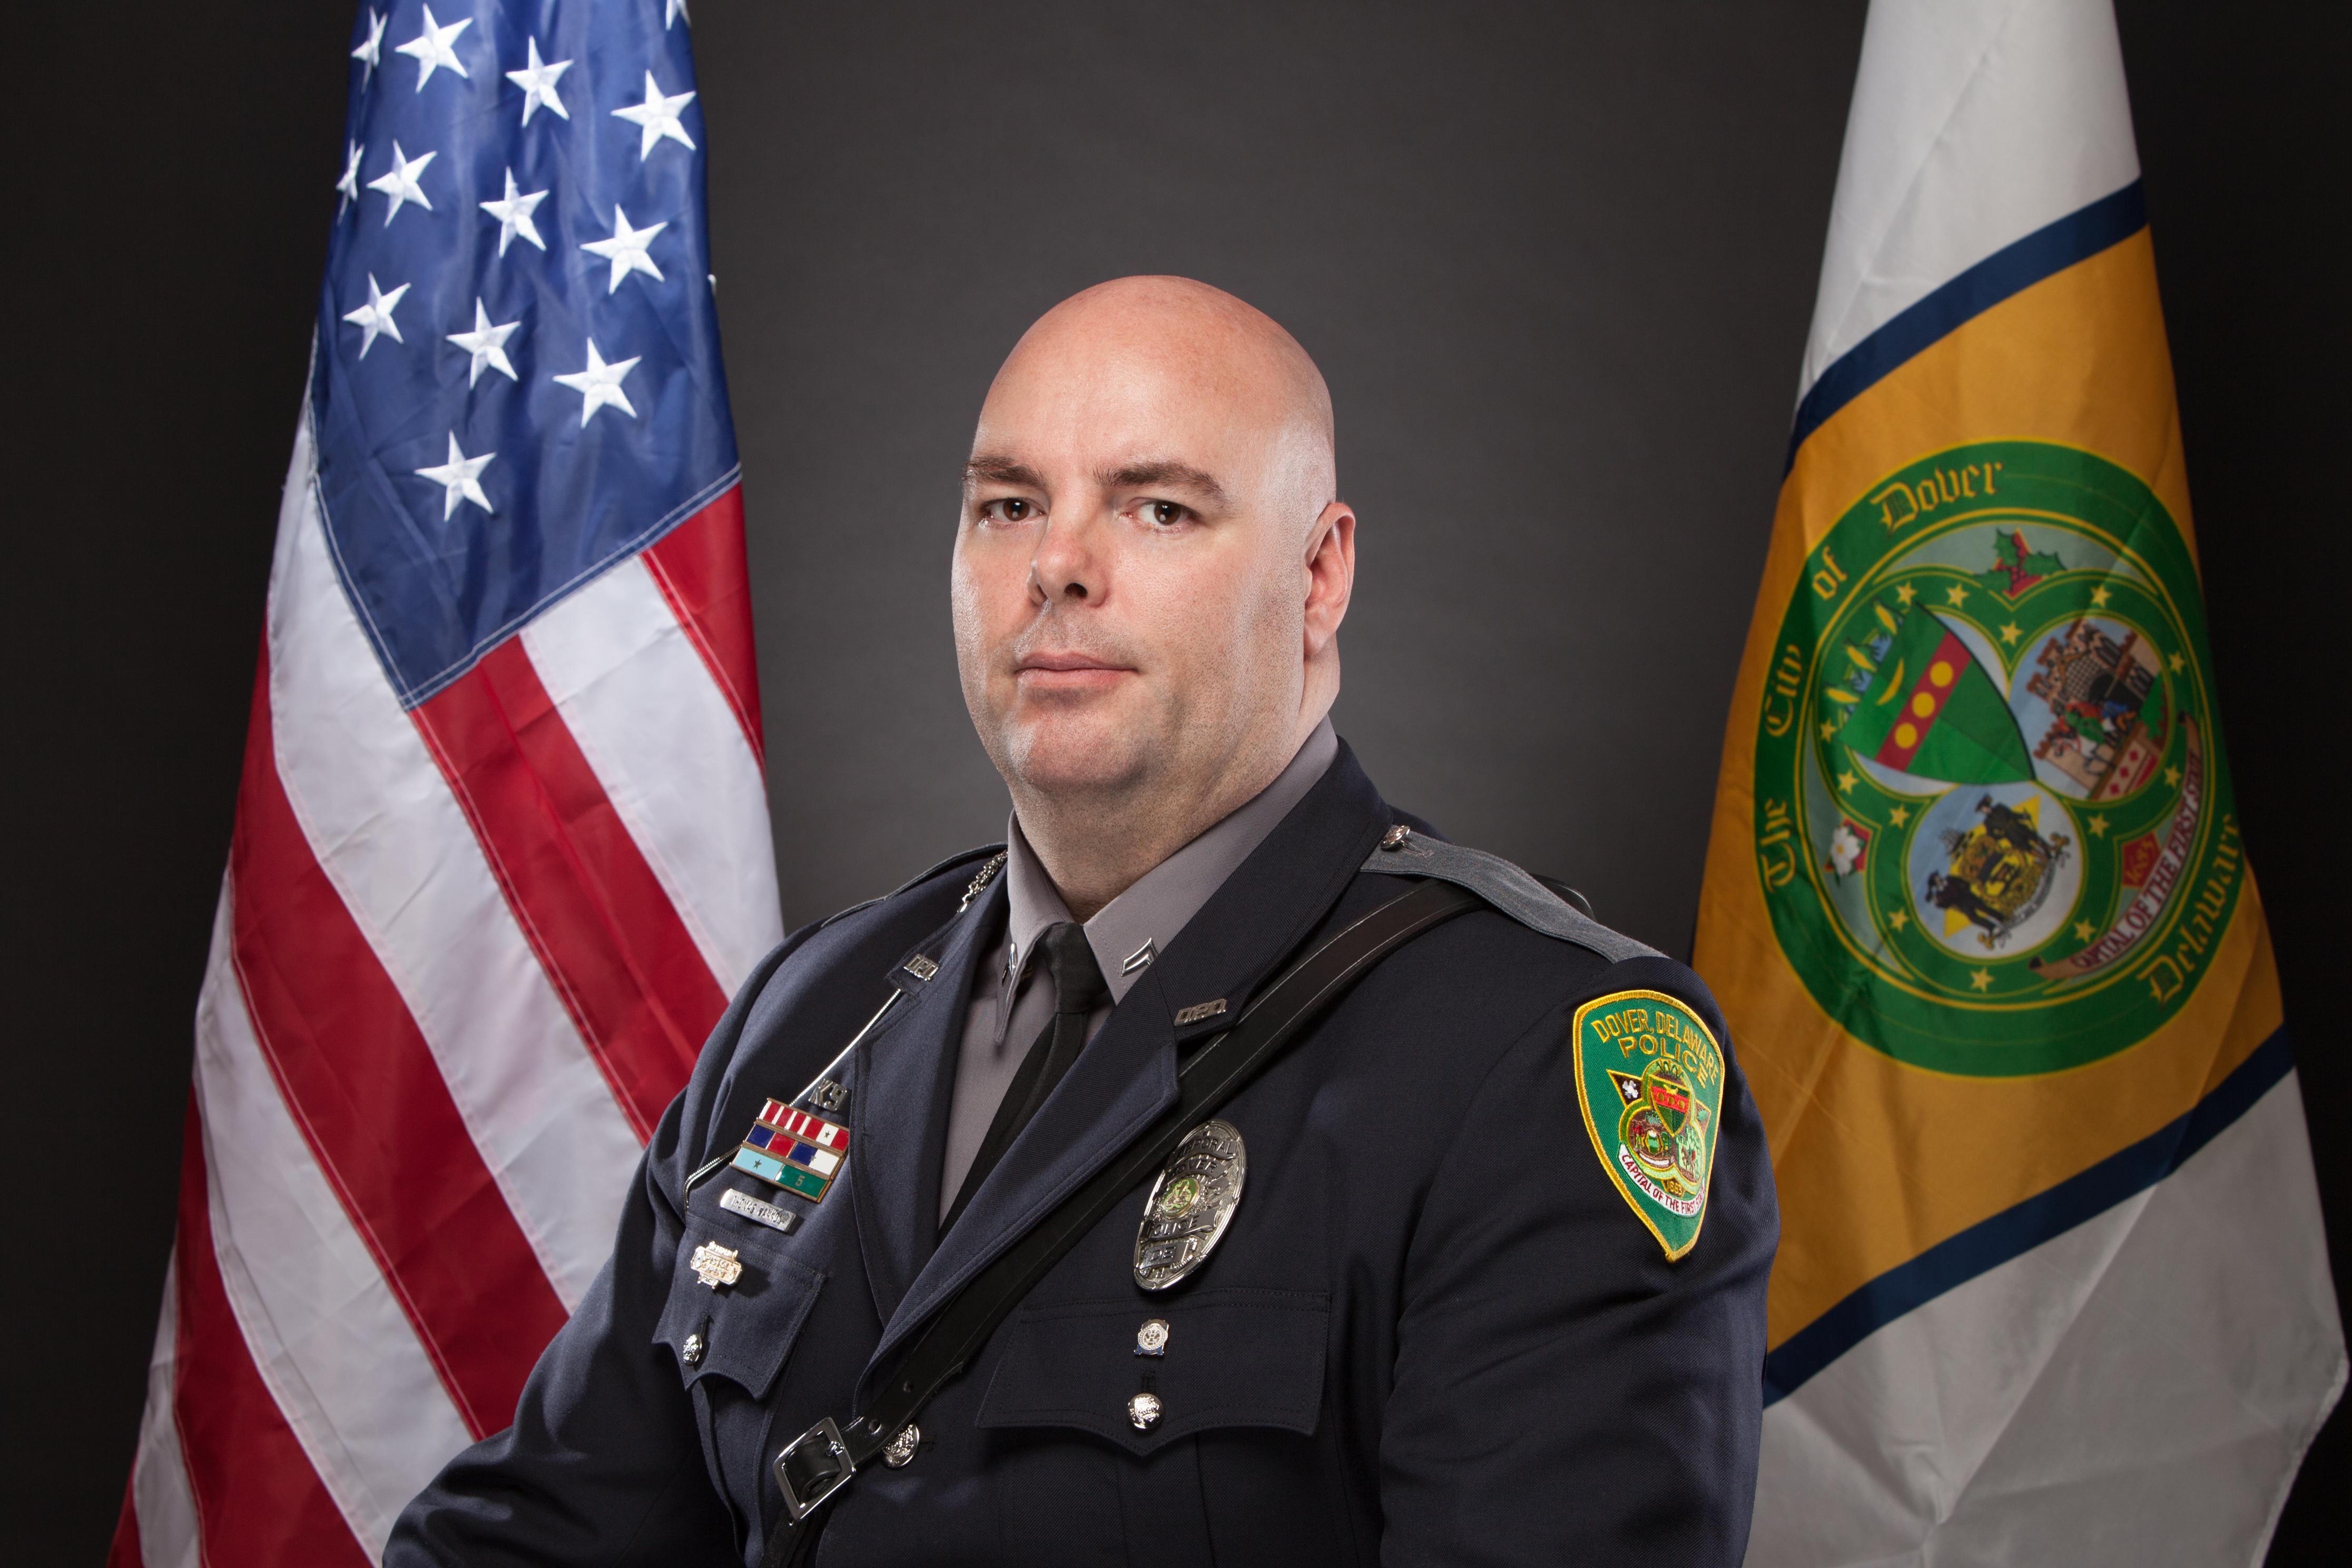 Corporal Thomas Hannon   Dover Police Department, Delaware